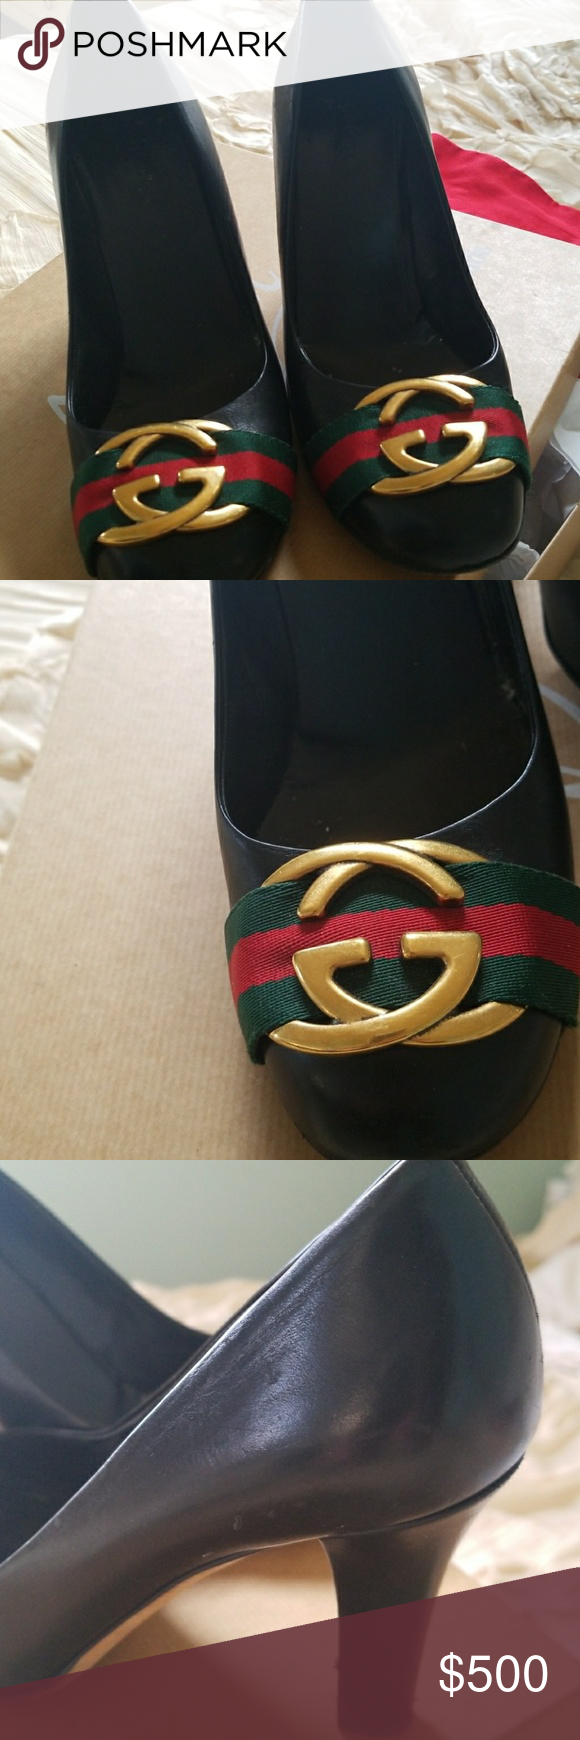 Gucci maryjane pumps